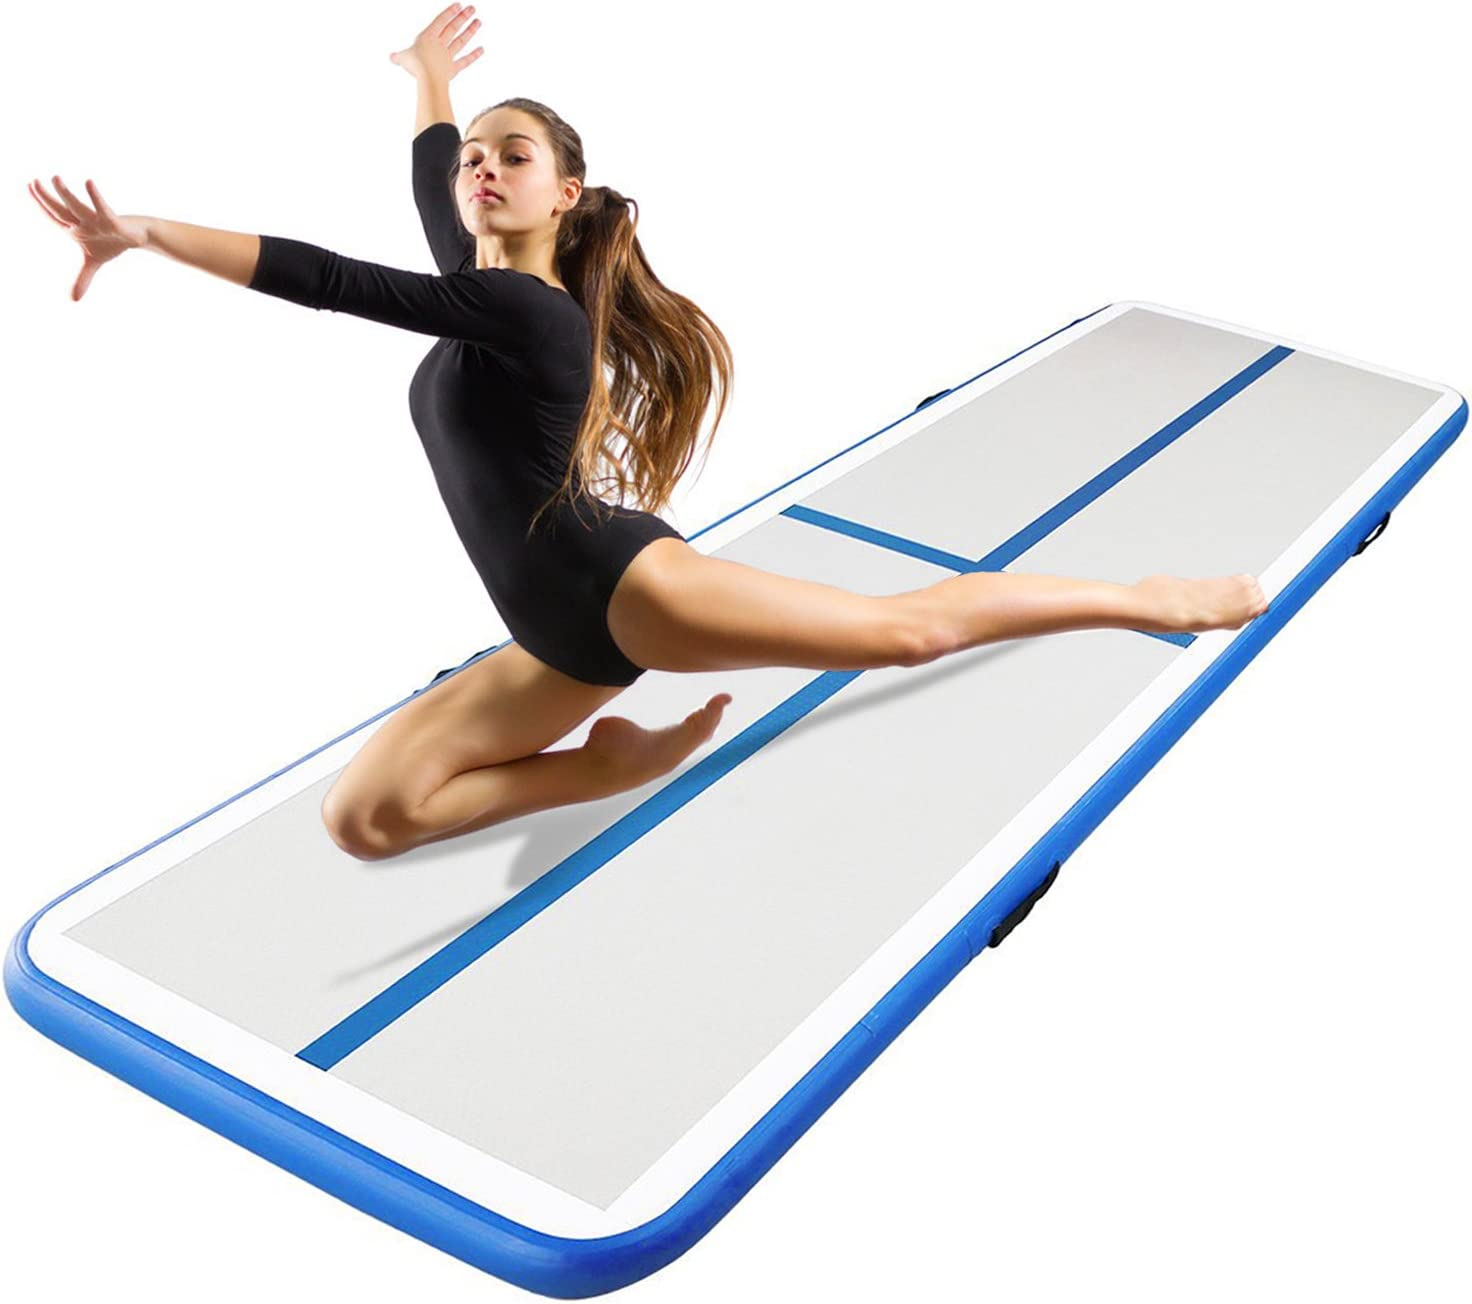 Aufblasbare Gymnastikmatte f/ür Gym//Yoga//Training//Kinder//Tumbling//Park//Home Use,Blau,200x100x10cm Taekwondo Somersault Luftkissen F-JX Airtrack Tumbling-Matte